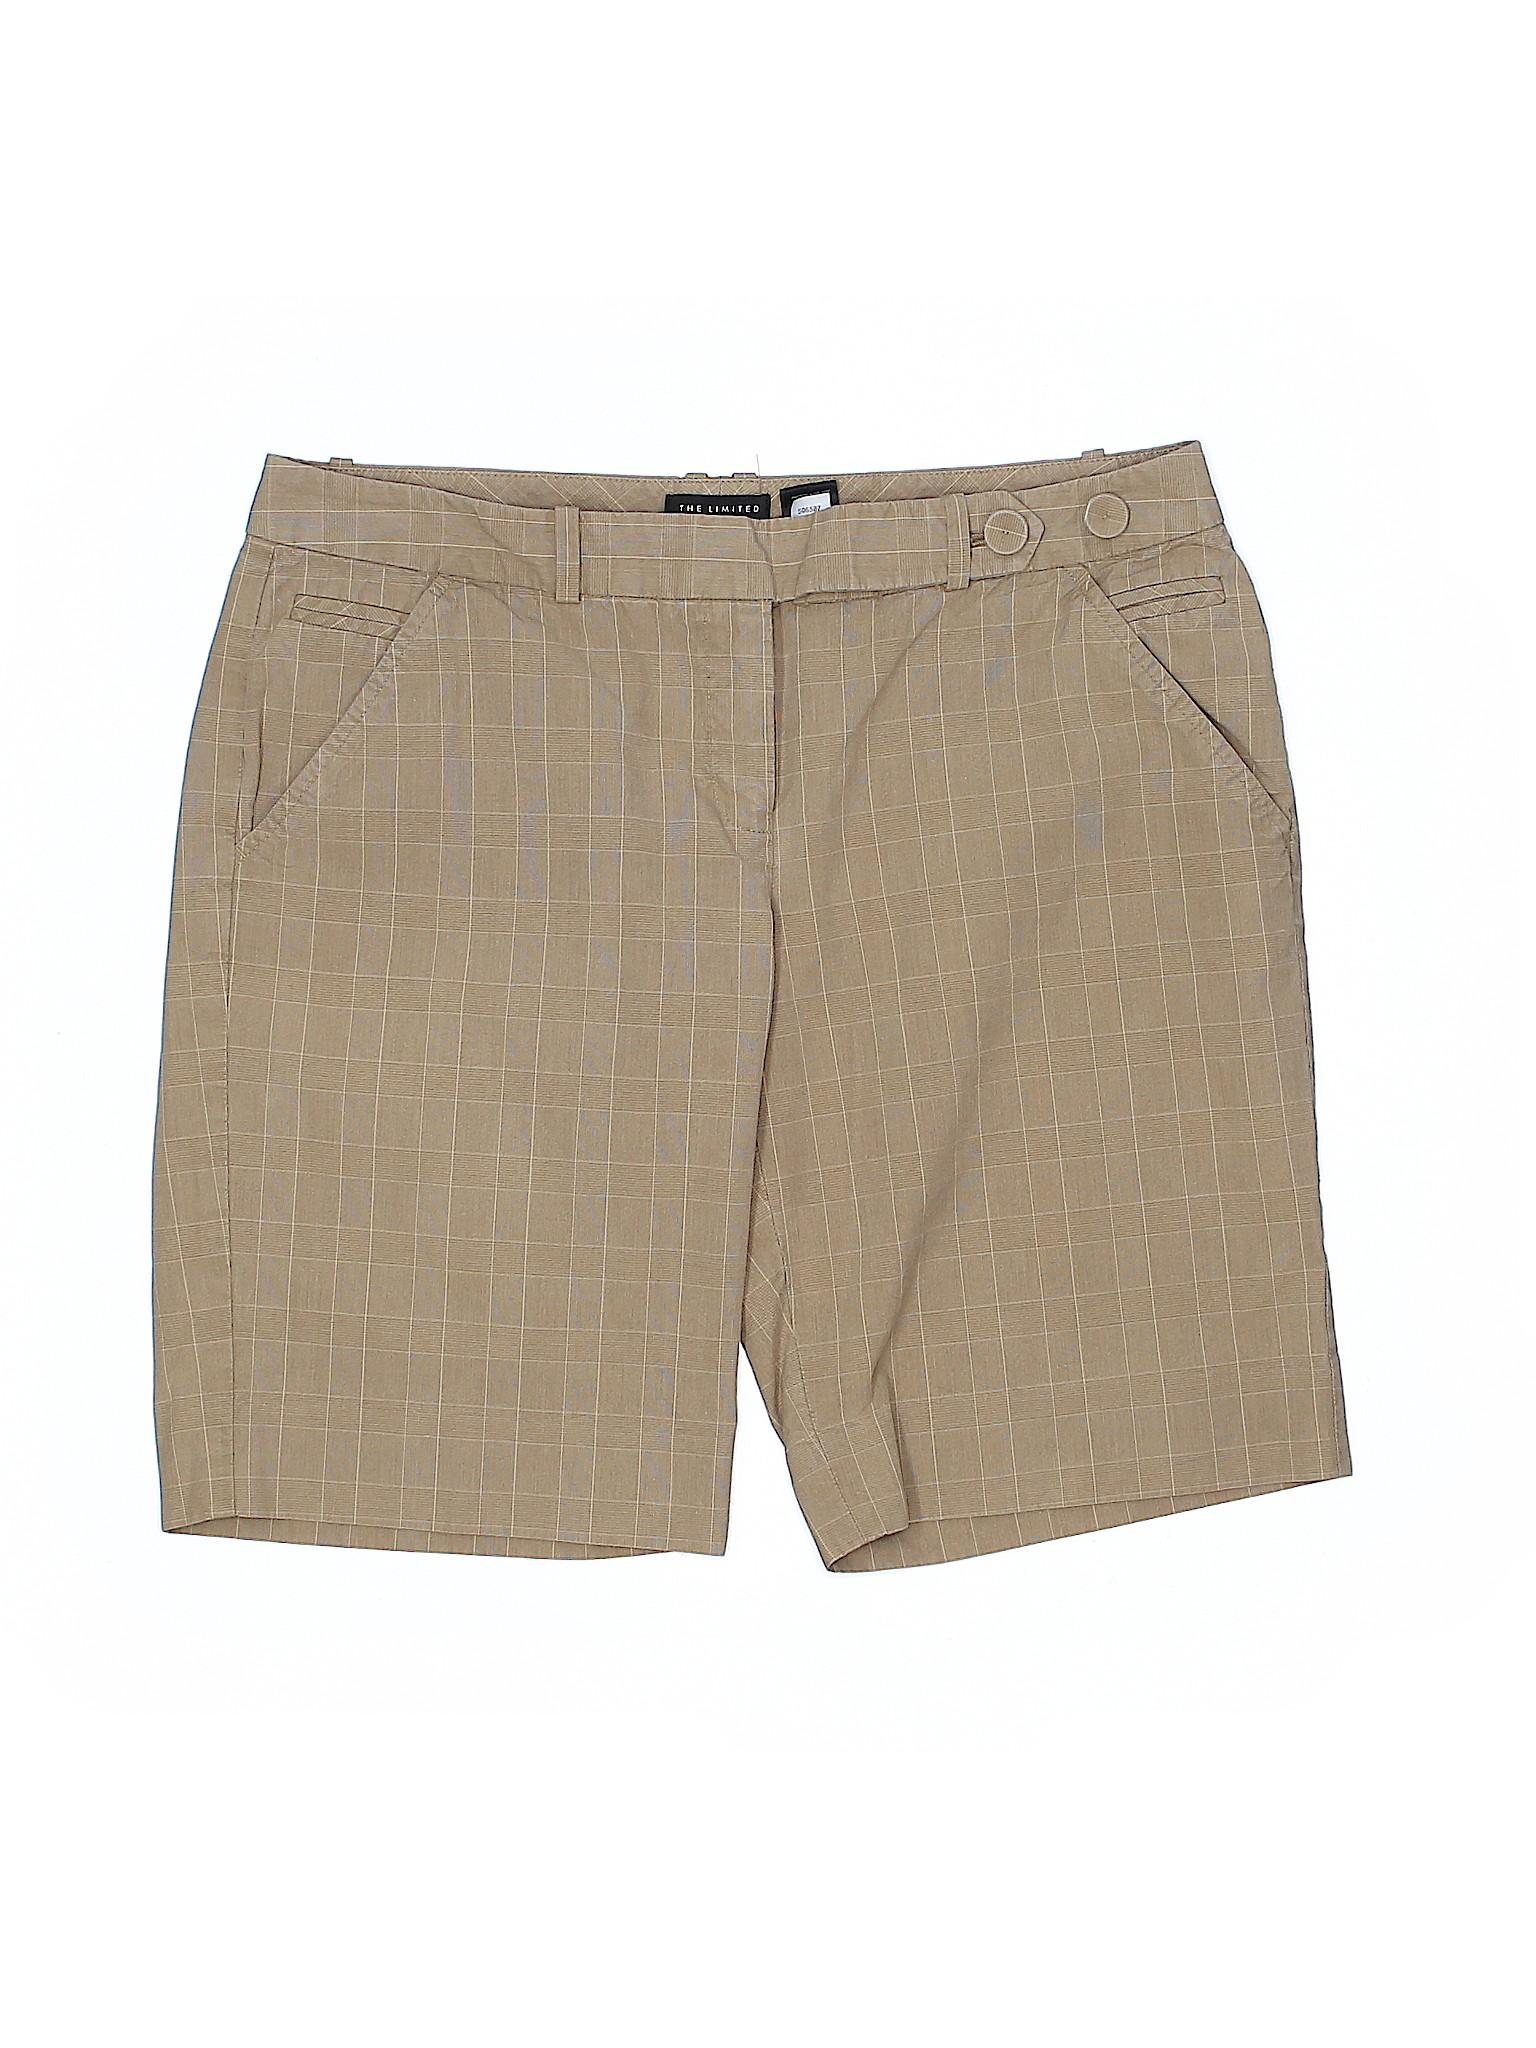 Boutique The Khaki leisure Shorts Limited rr1cwFxq4A